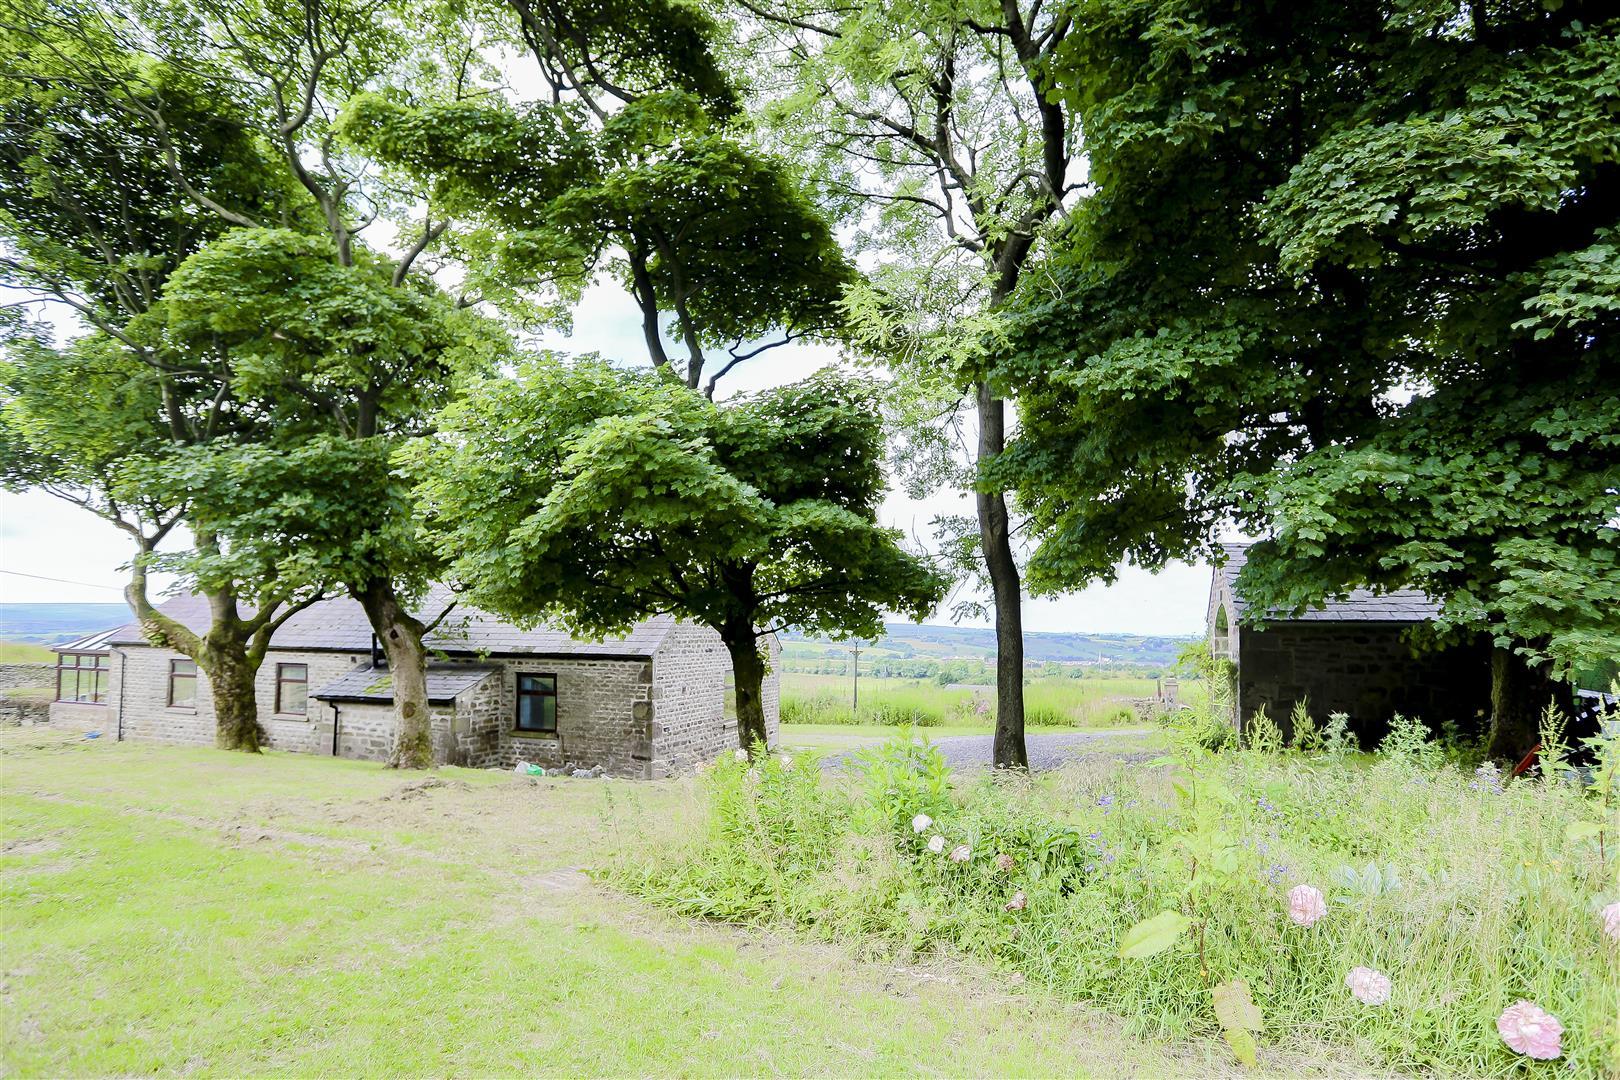 2 Bedroom Barn Conversion For Sale - IMG_2429.jpg